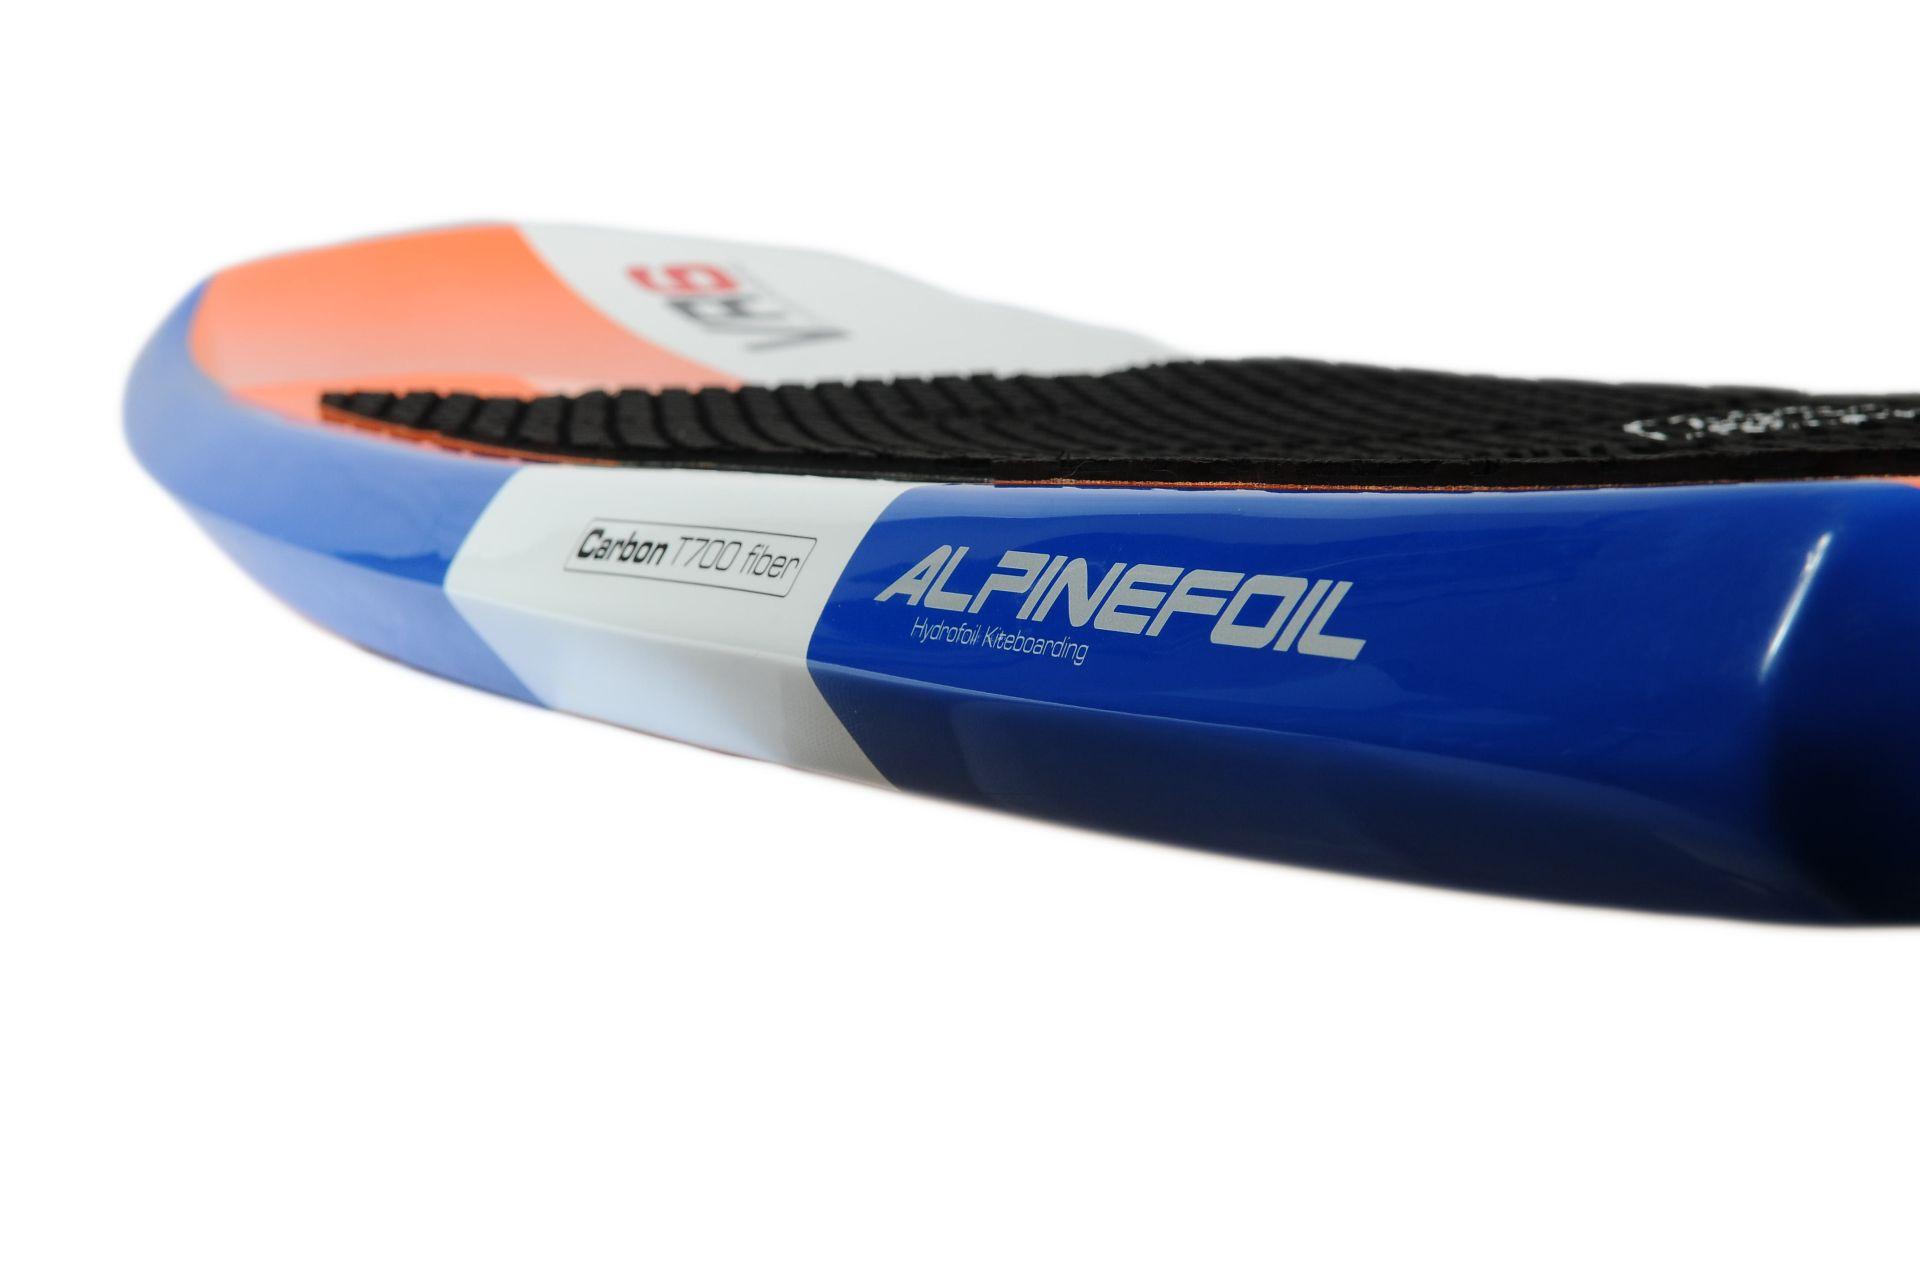 Kitefoil foilboard alpinefoil vr6 4 1